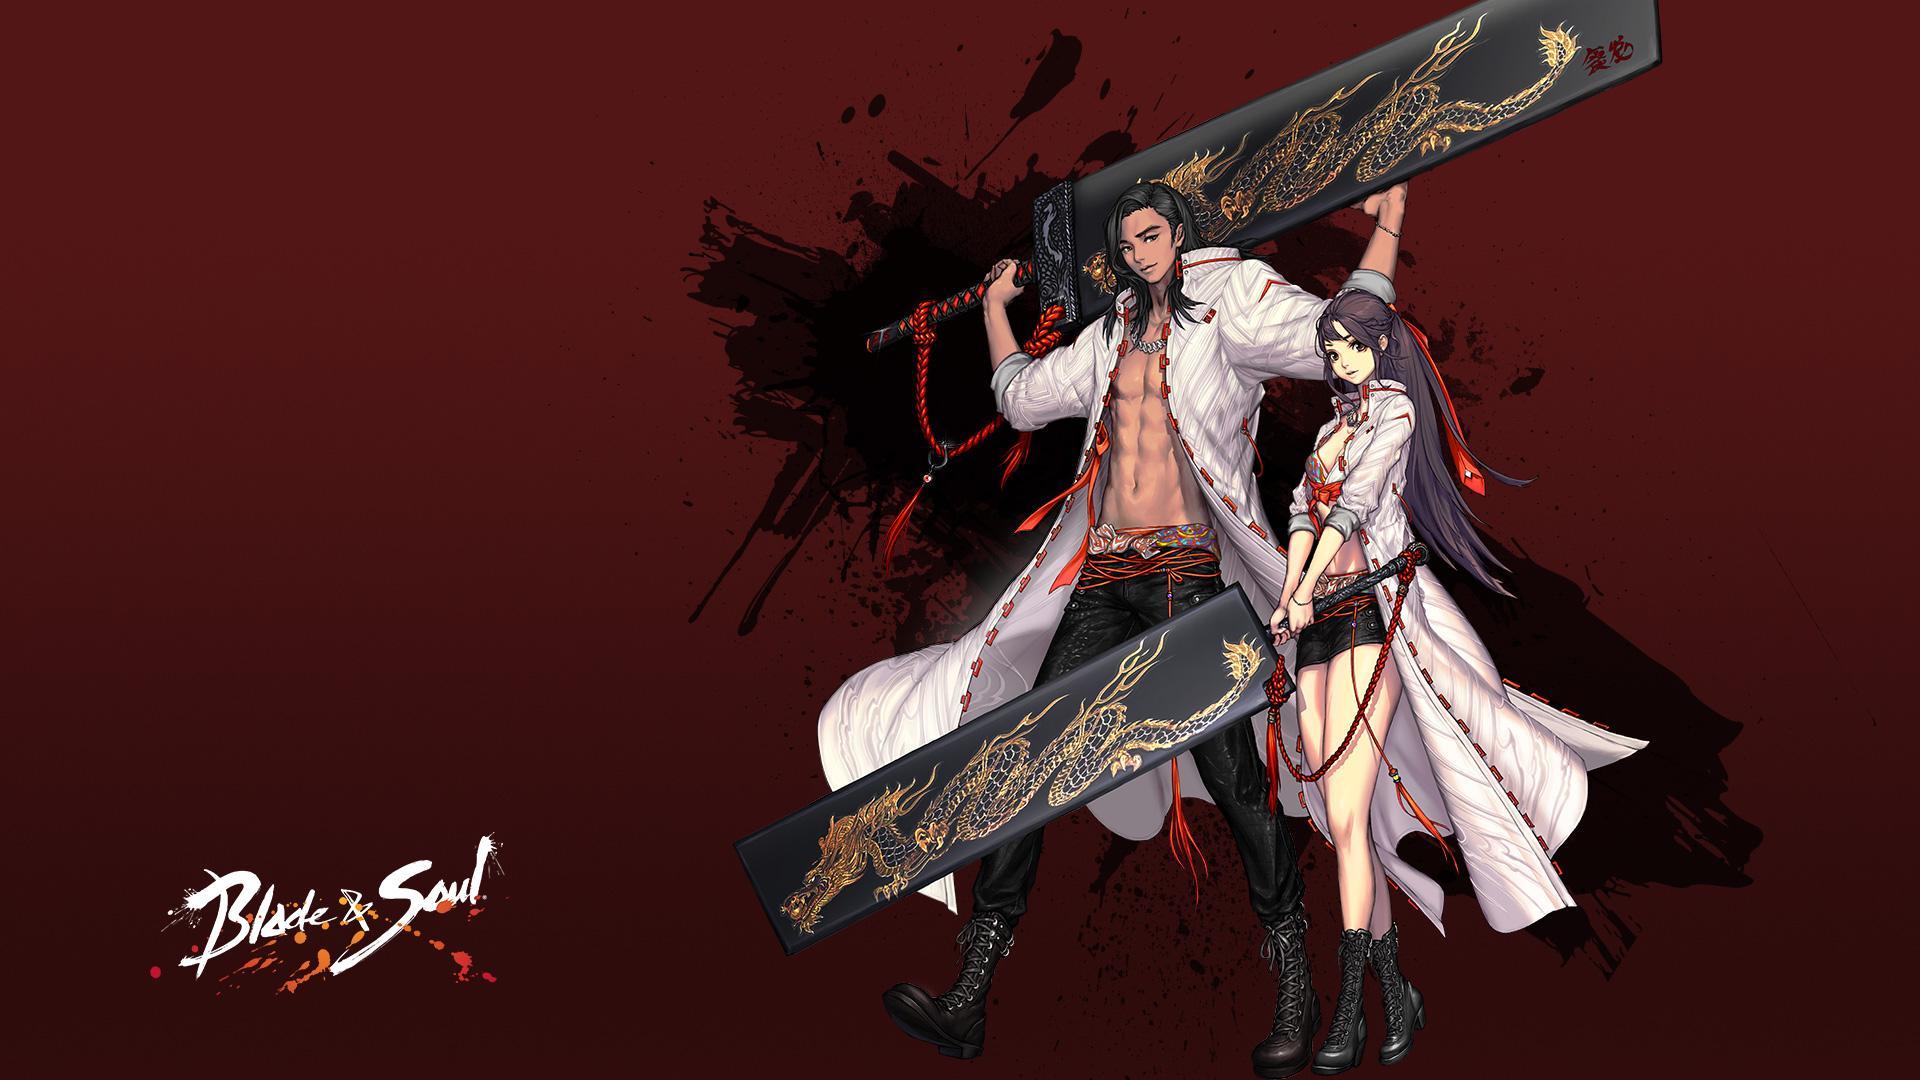 Blade & Soul greatsword new class